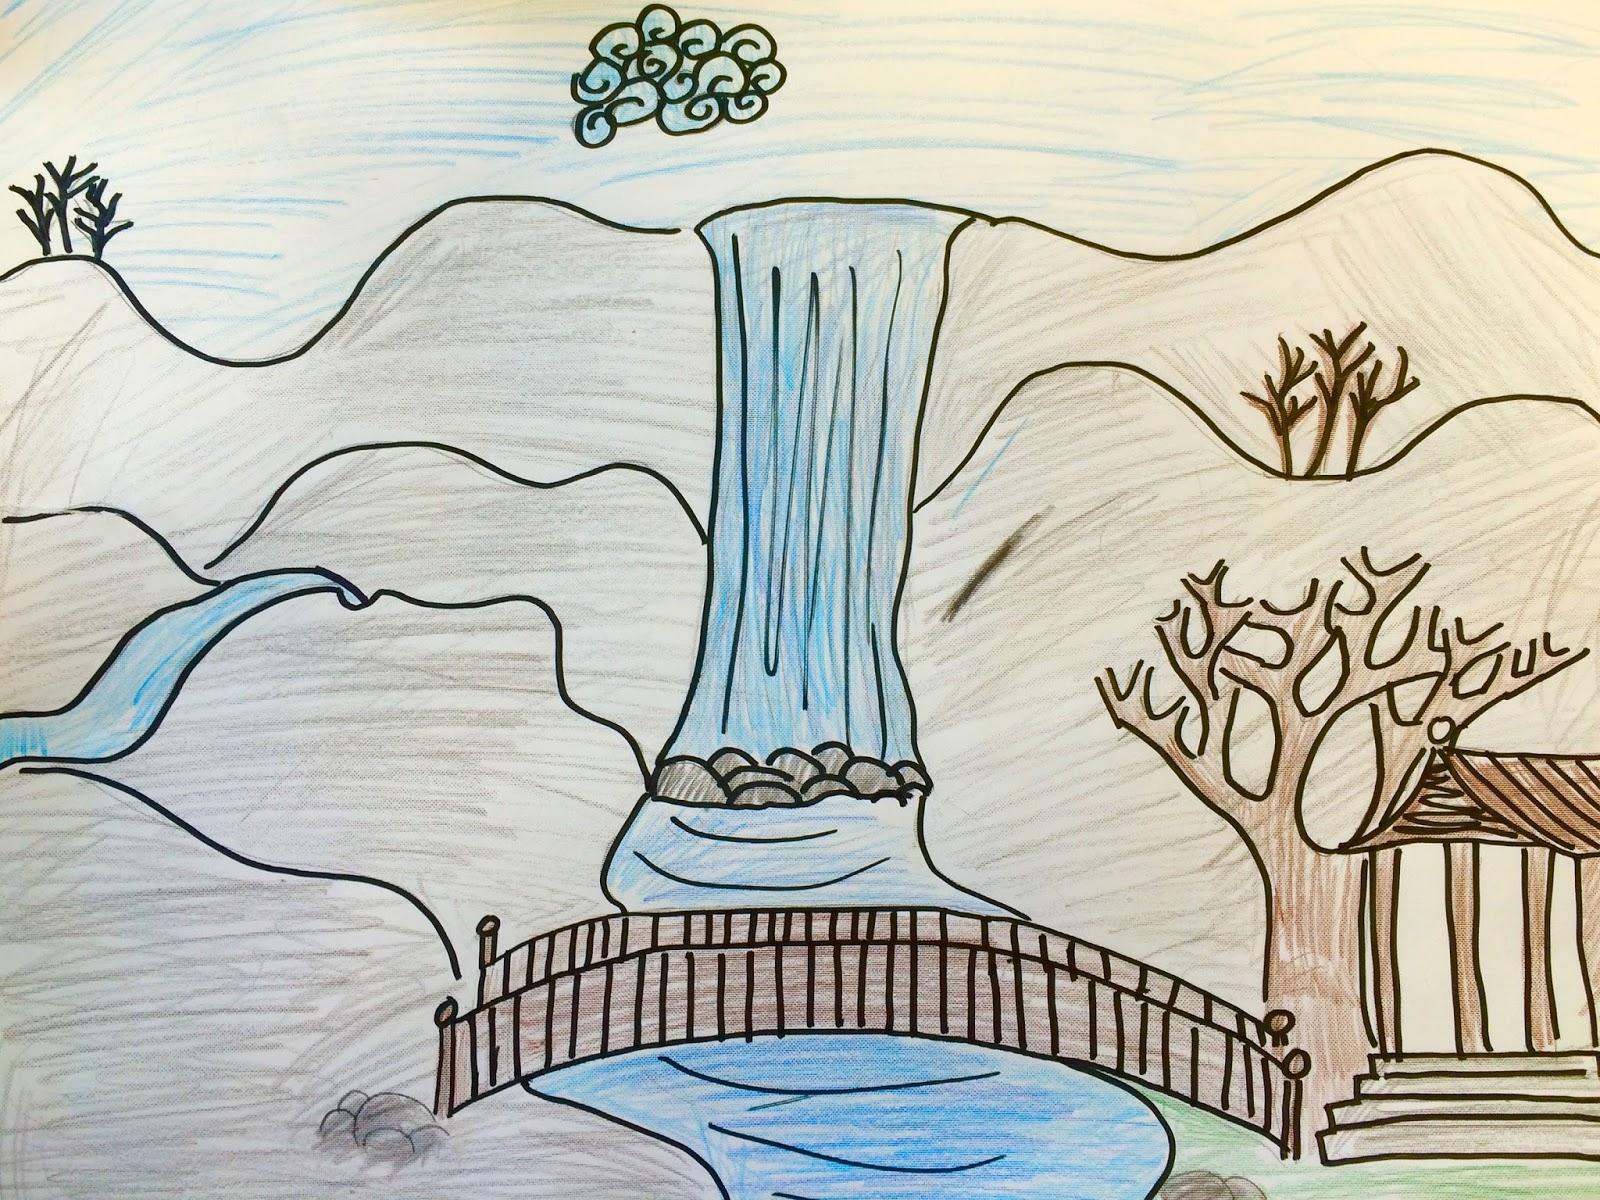 Niagara Falls Wallpaper Nature The Helpful Art Teacher The Art Of The Brush